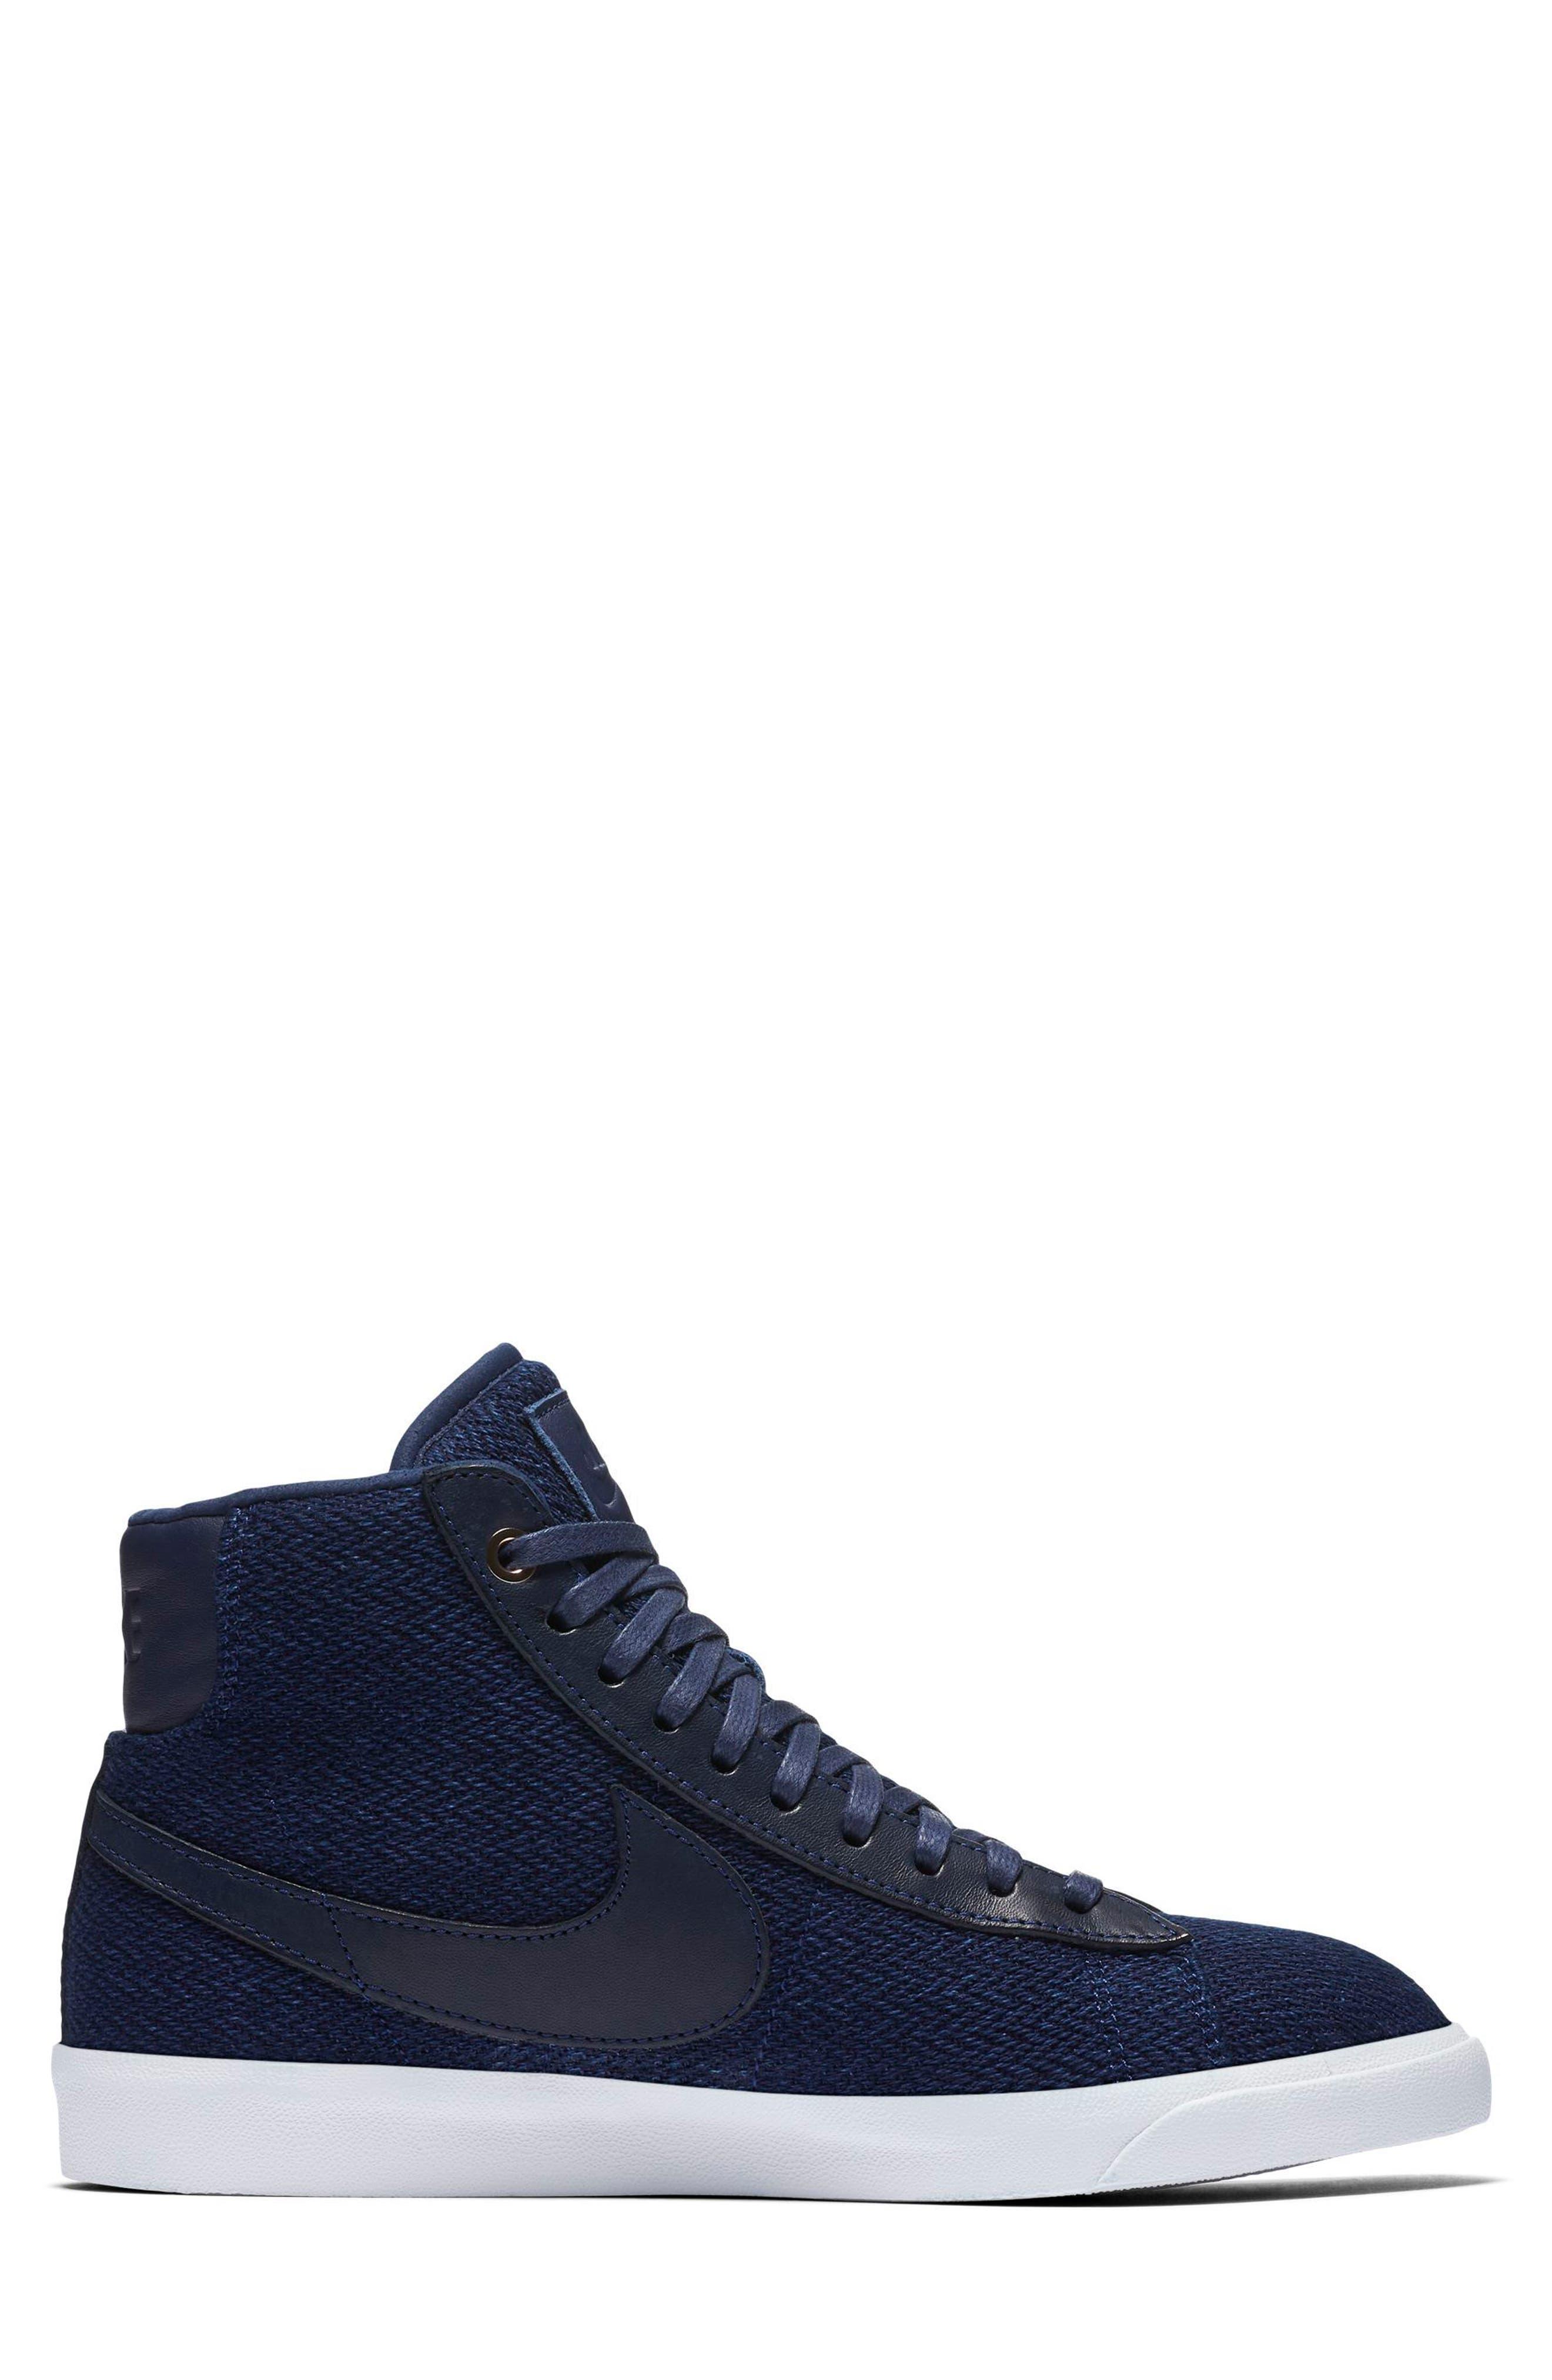 Blazer Mid Premium LX Sneaker,                             Alternate thumbnail 3, color,                             400